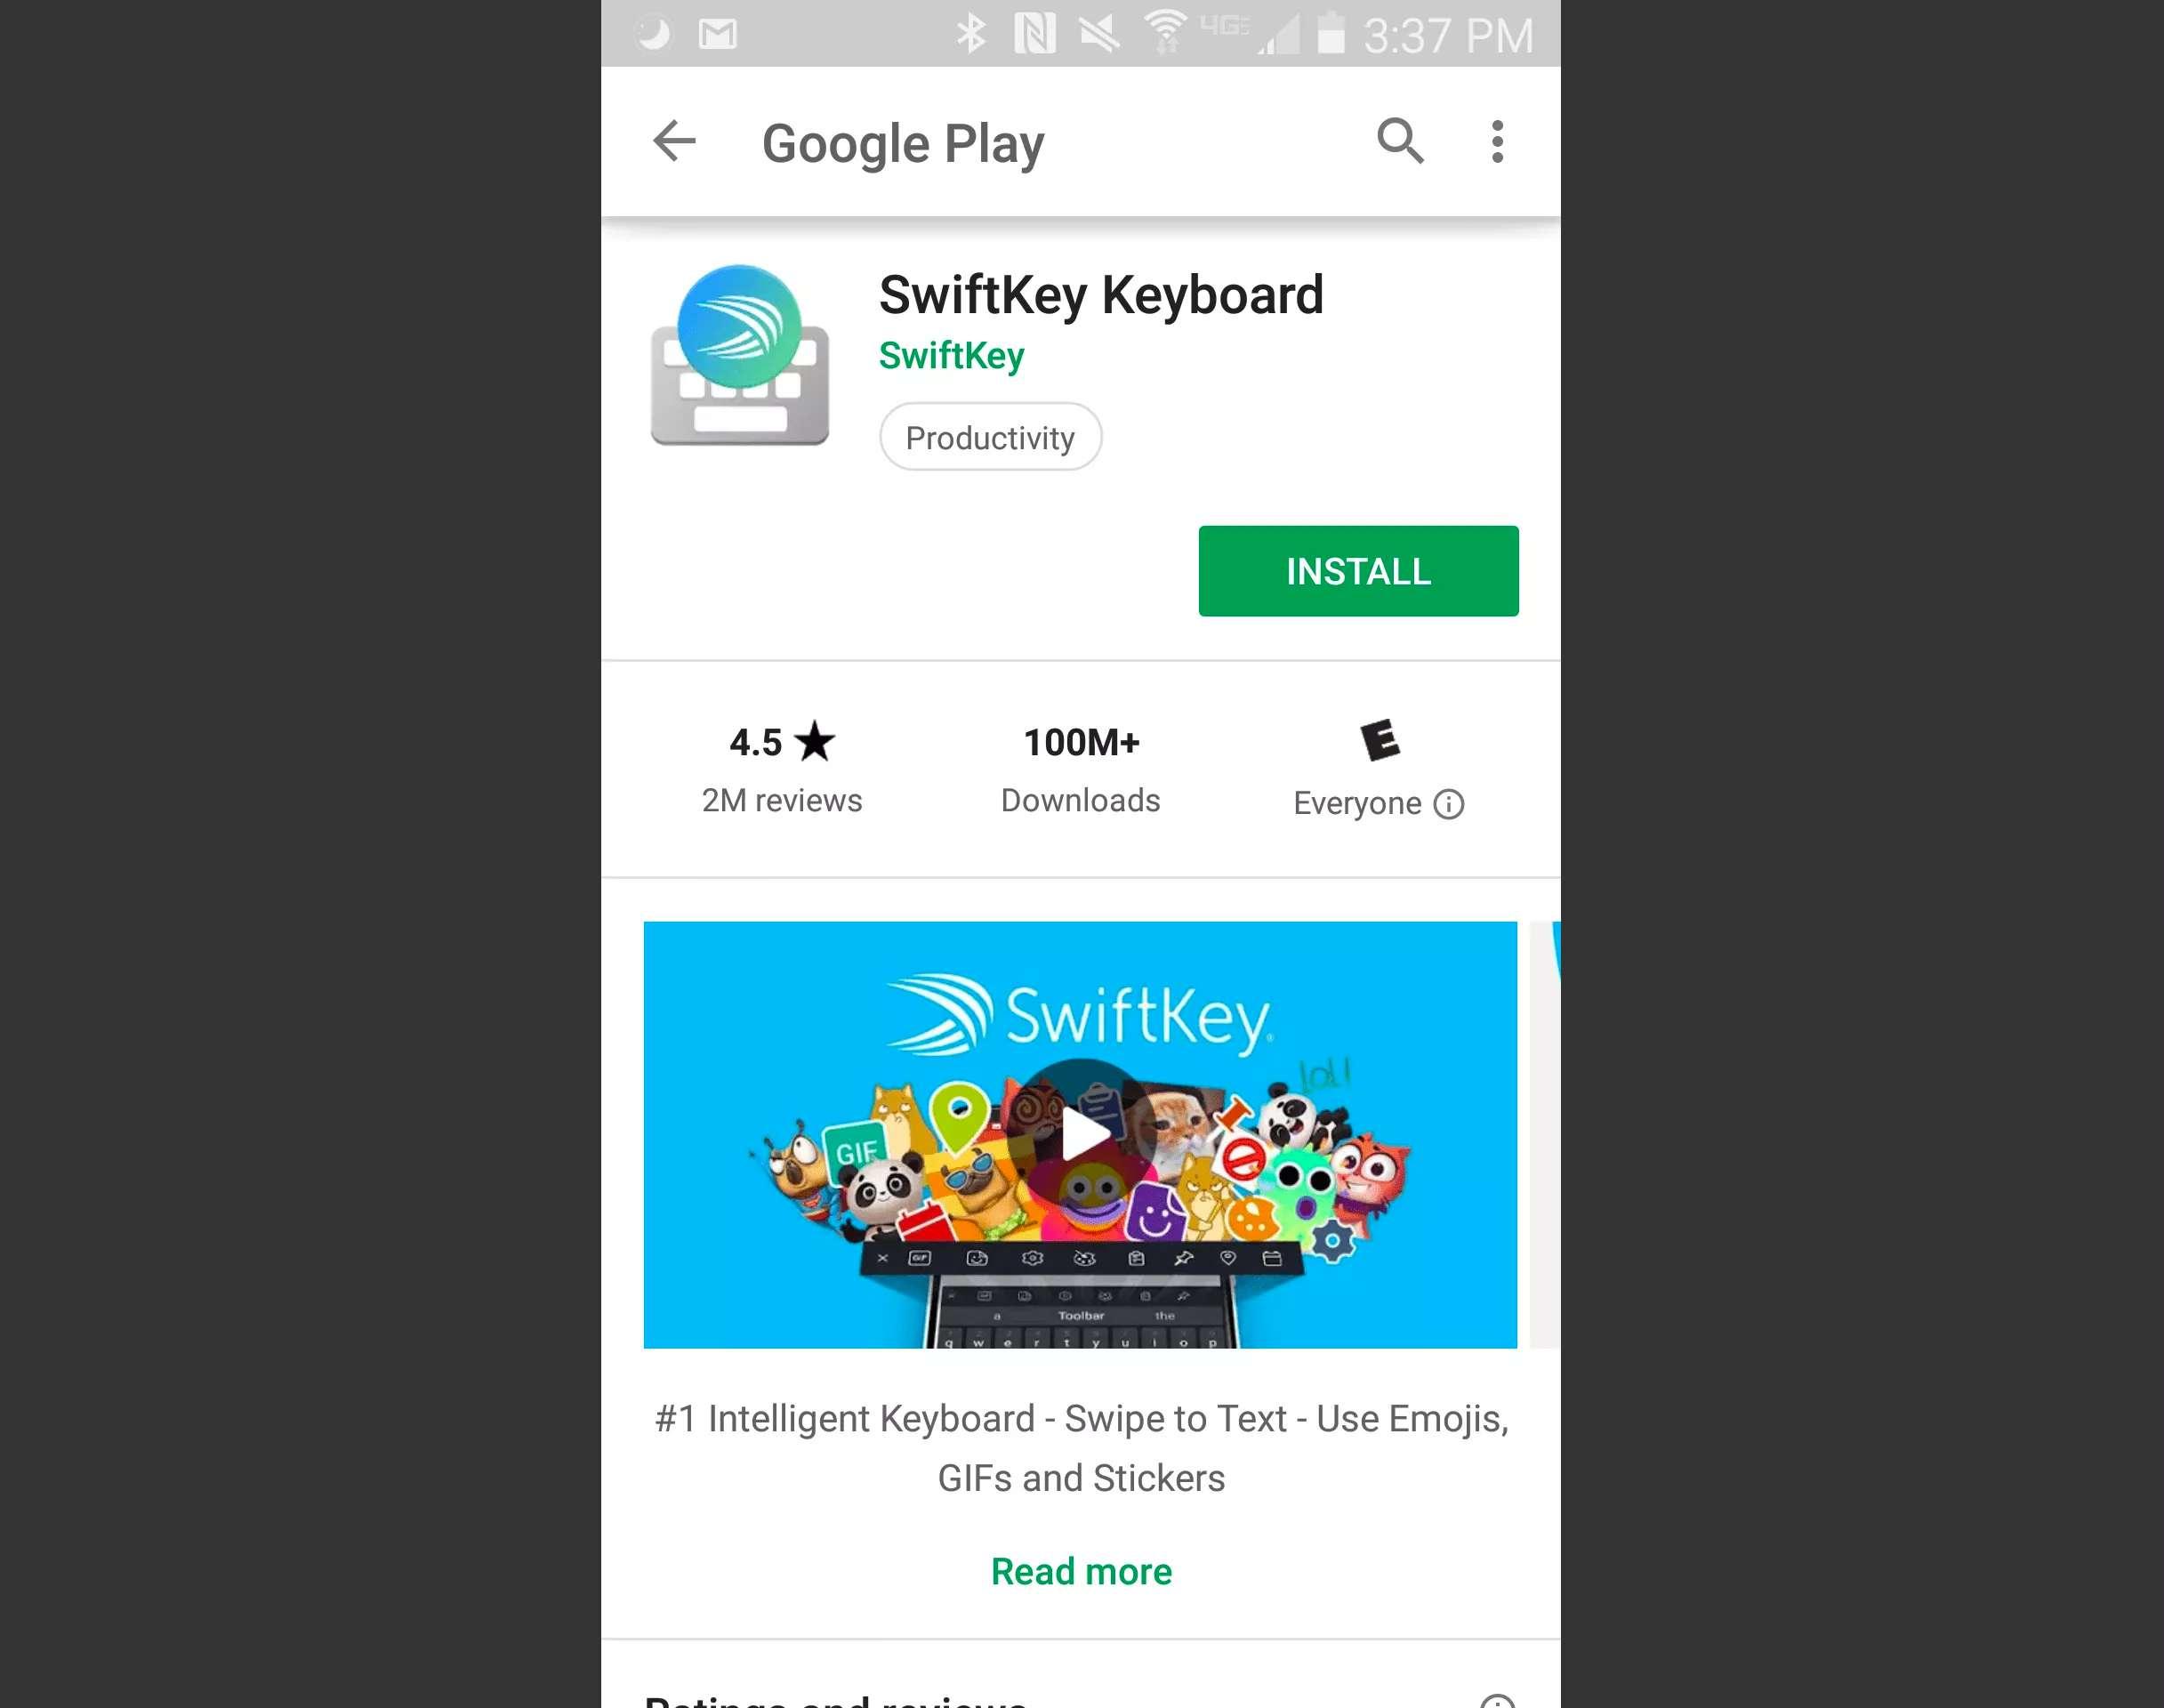 SwiftKey Keyboard on Google Play